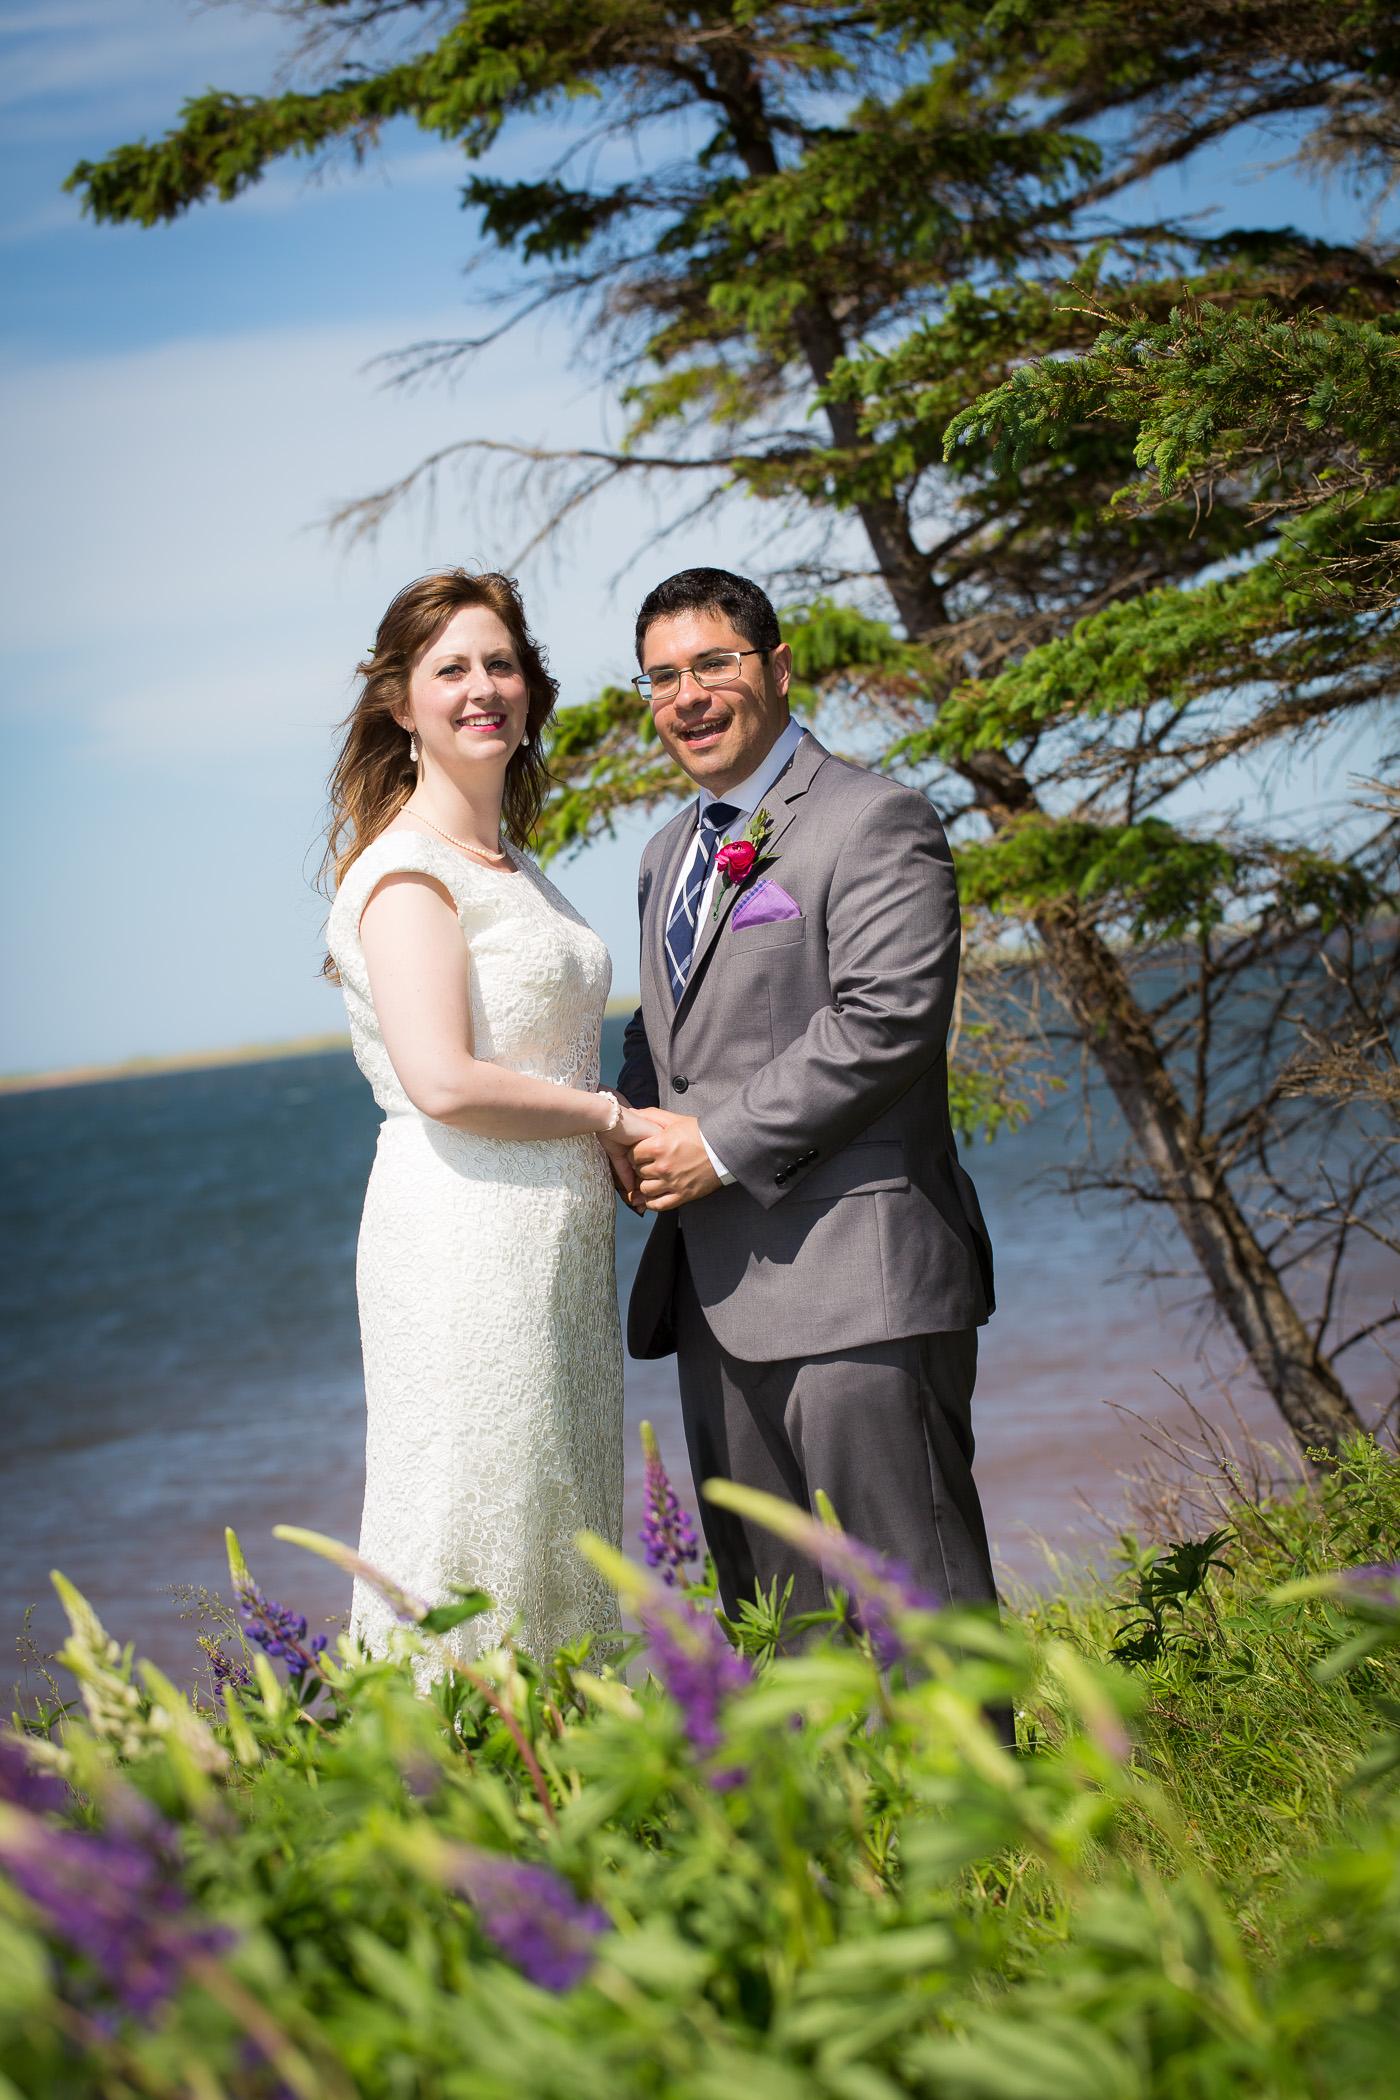 PEI Intimate Wedding Photographer 6